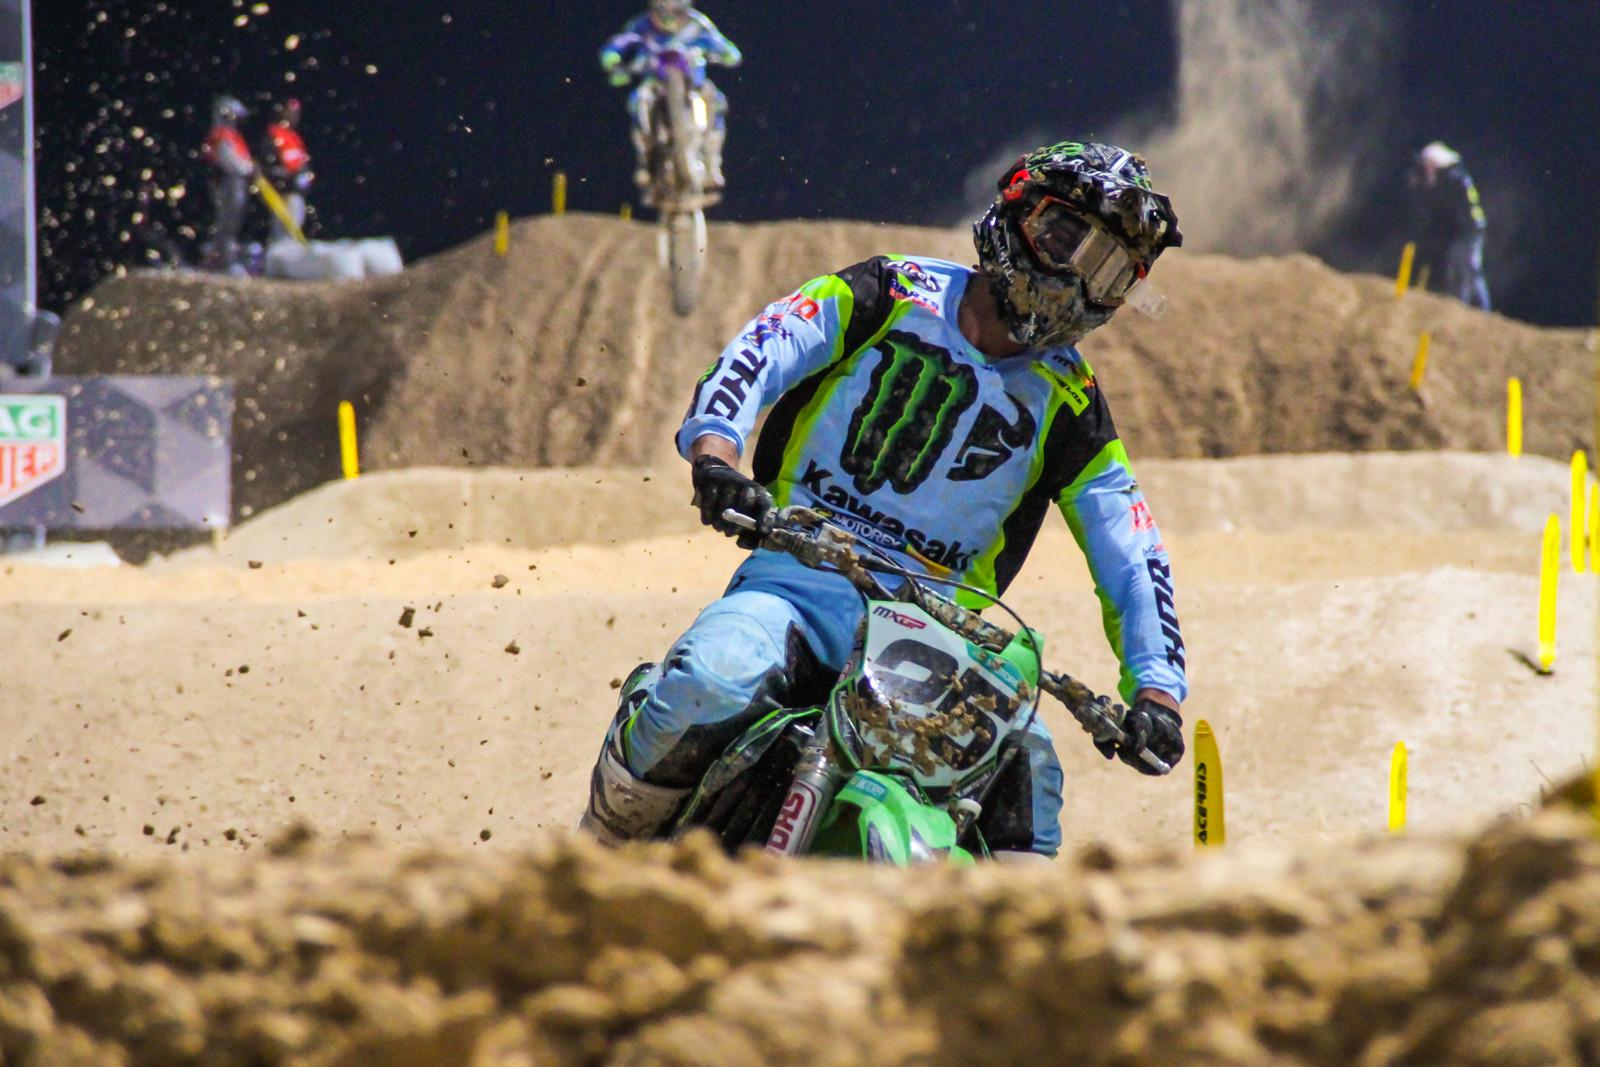 Clement Desalle - Photo Blast: 2017 MXGP of Qatar - Motocross Pictures - Vital MX